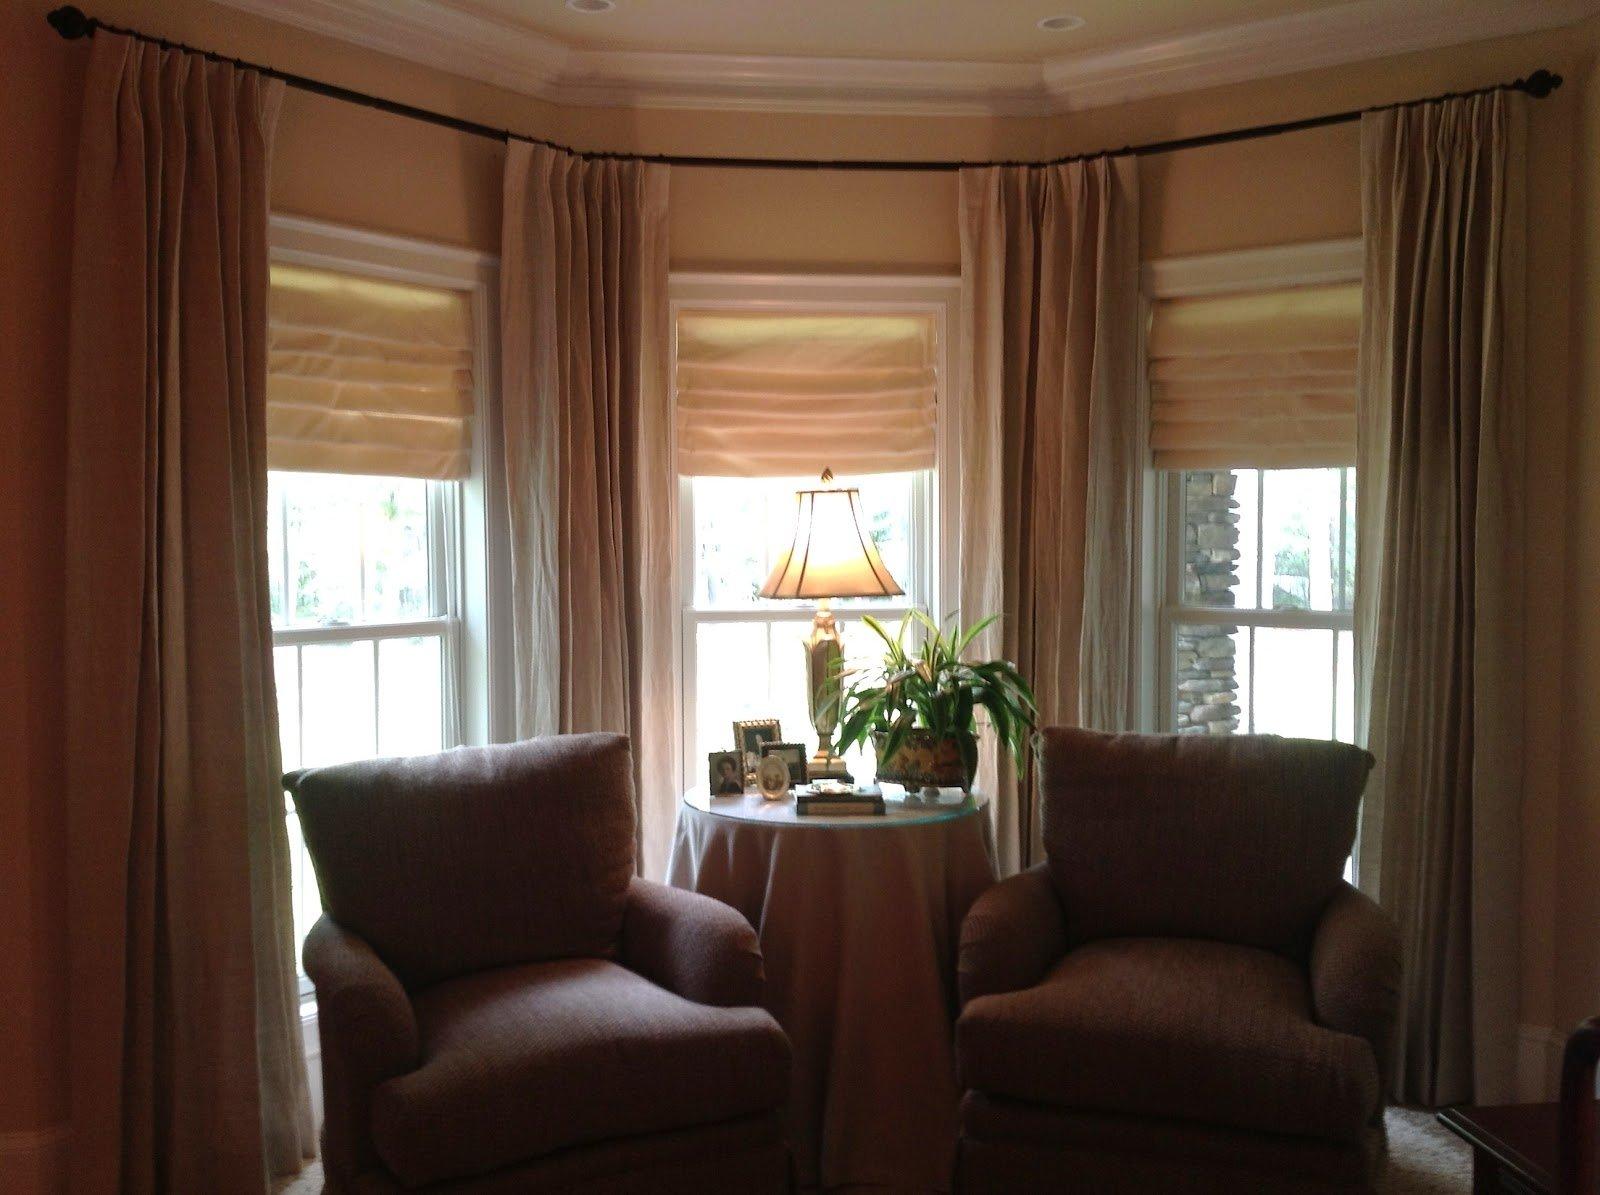 10 Wonderful Bay Window Treatment Ideas Pictures bay window curtain ideas treatments kitchen dma homes 6704 2020